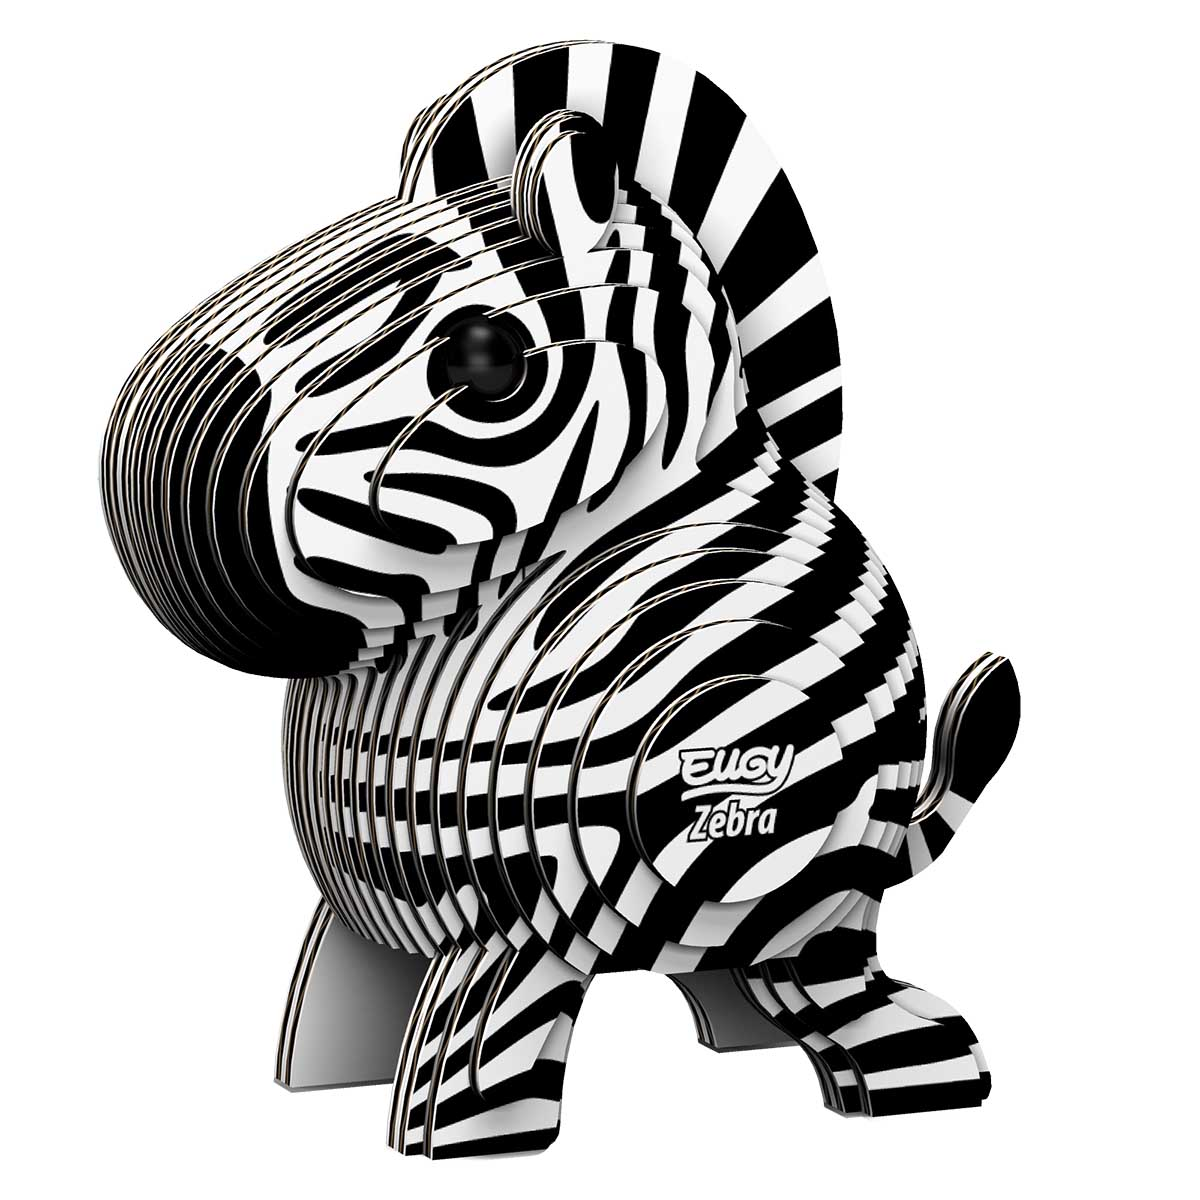 Zebra Eugy Zebras 3D Puzzle